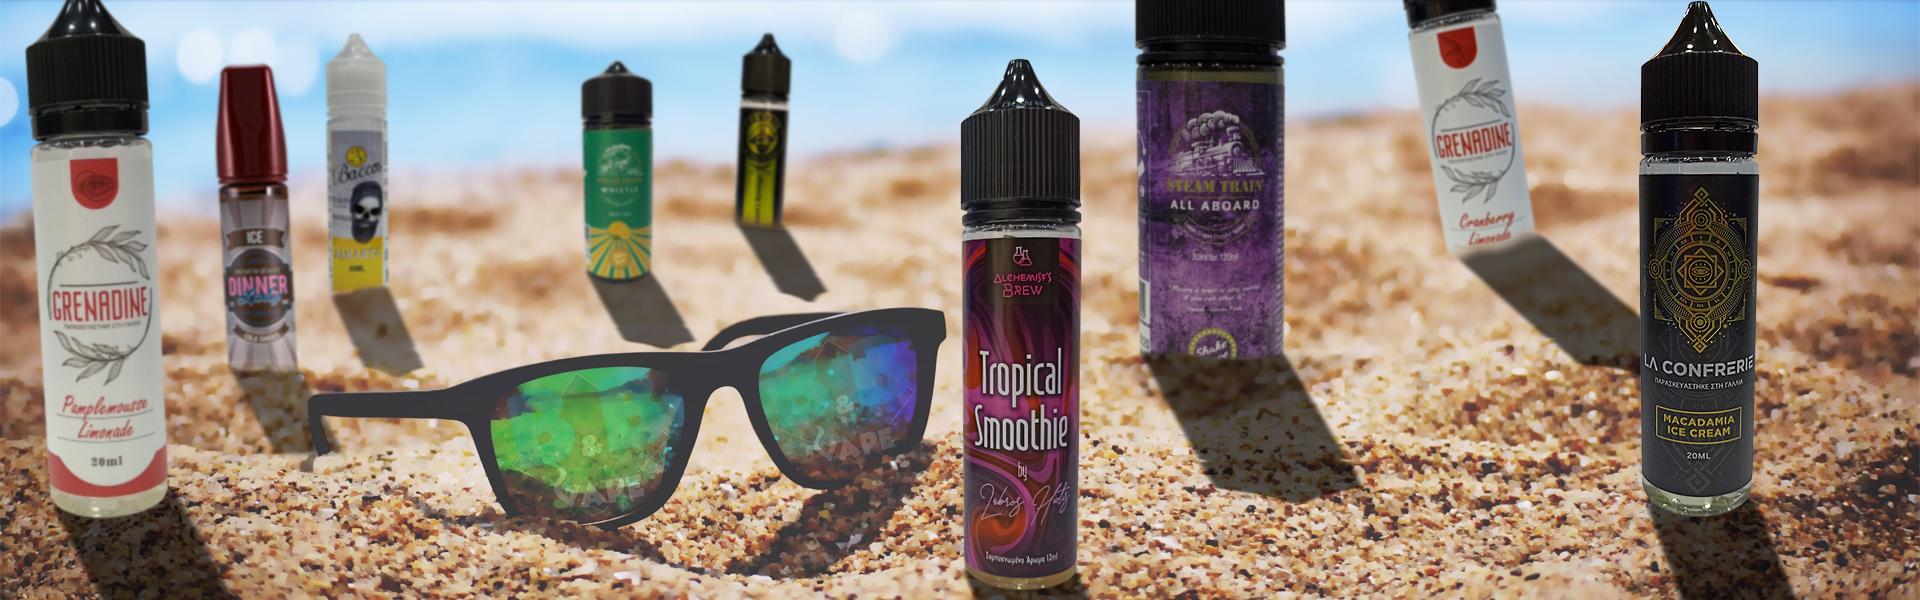 Summer Liquids - Καλοκαιρινά Υγρά